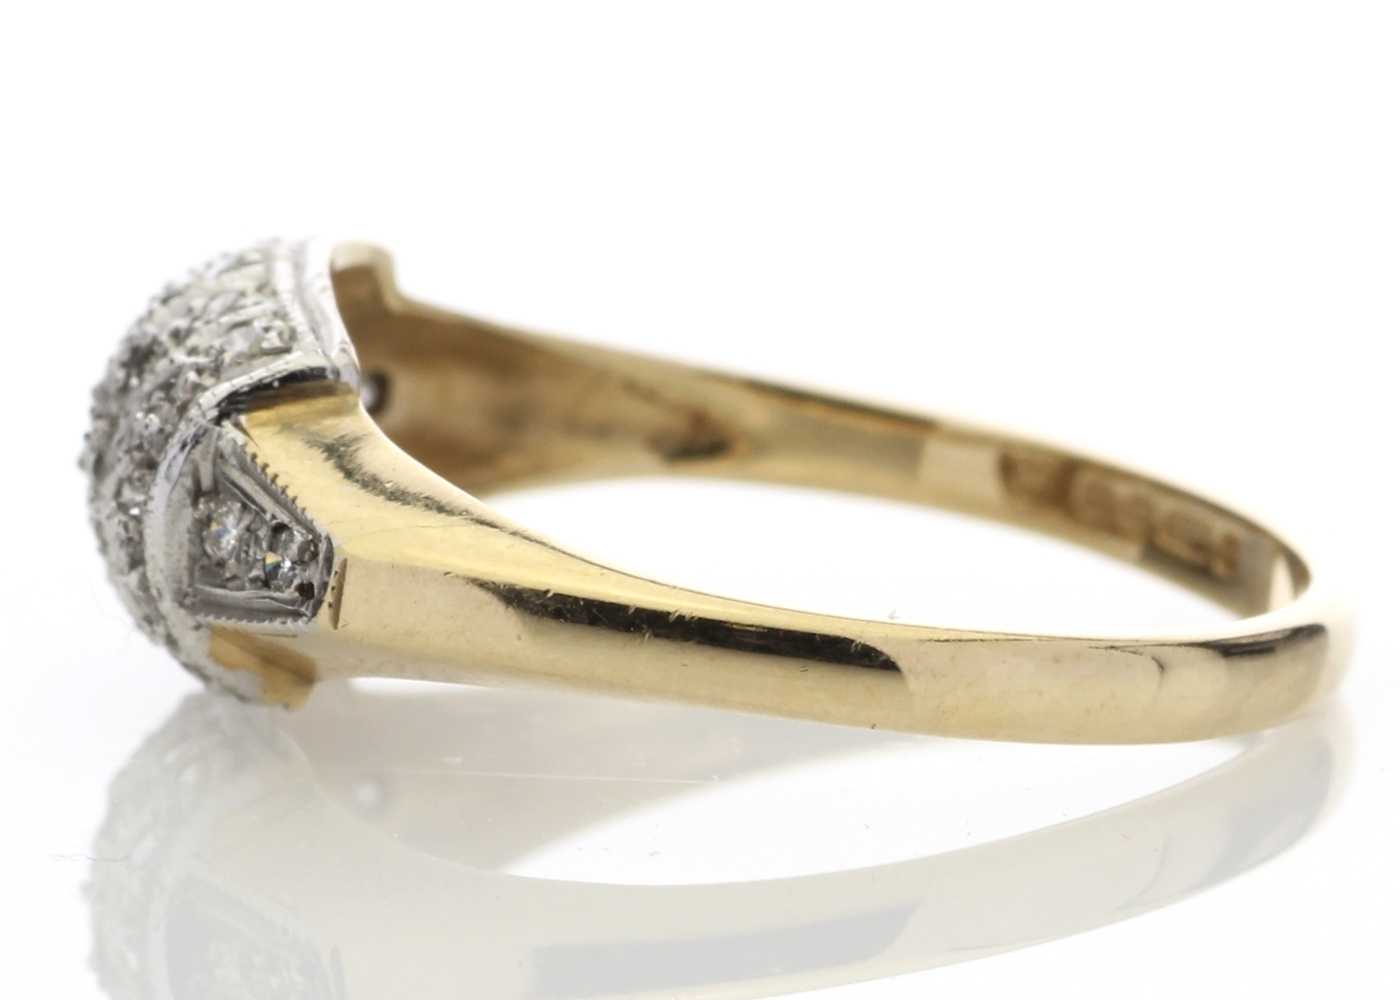 9ct Ladies Dress Diamond Ring 0.29 Carats - Image 3 of 4